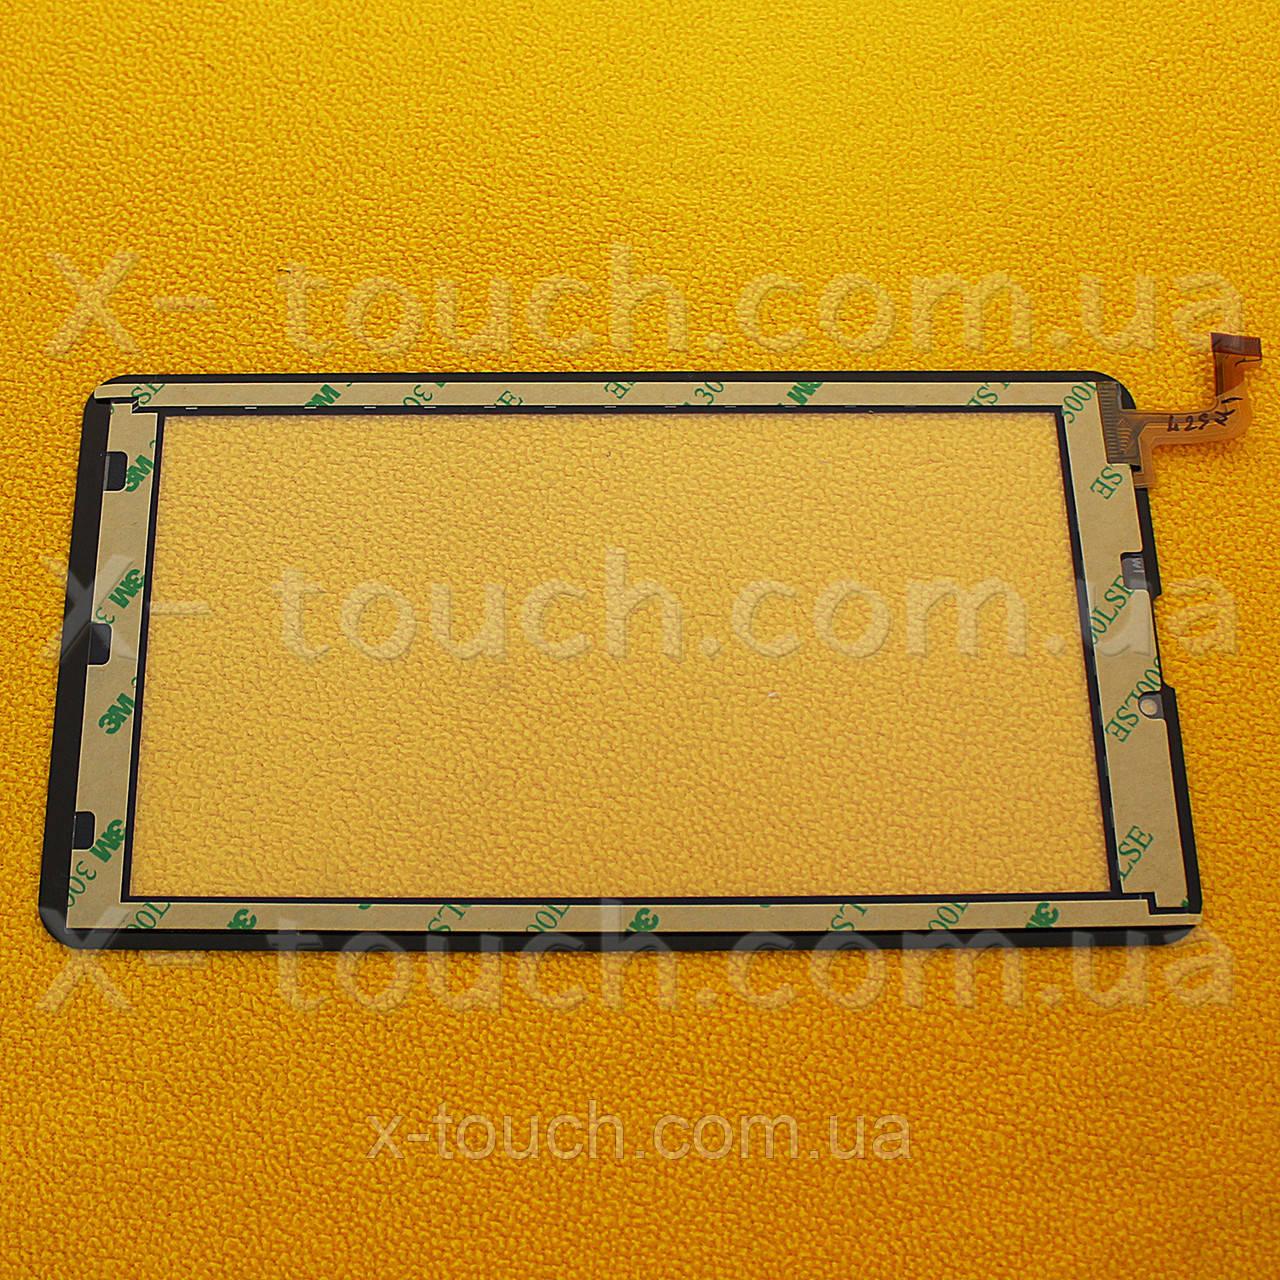 Тачскрин, сенсор  ZHC-0525A  для планшета